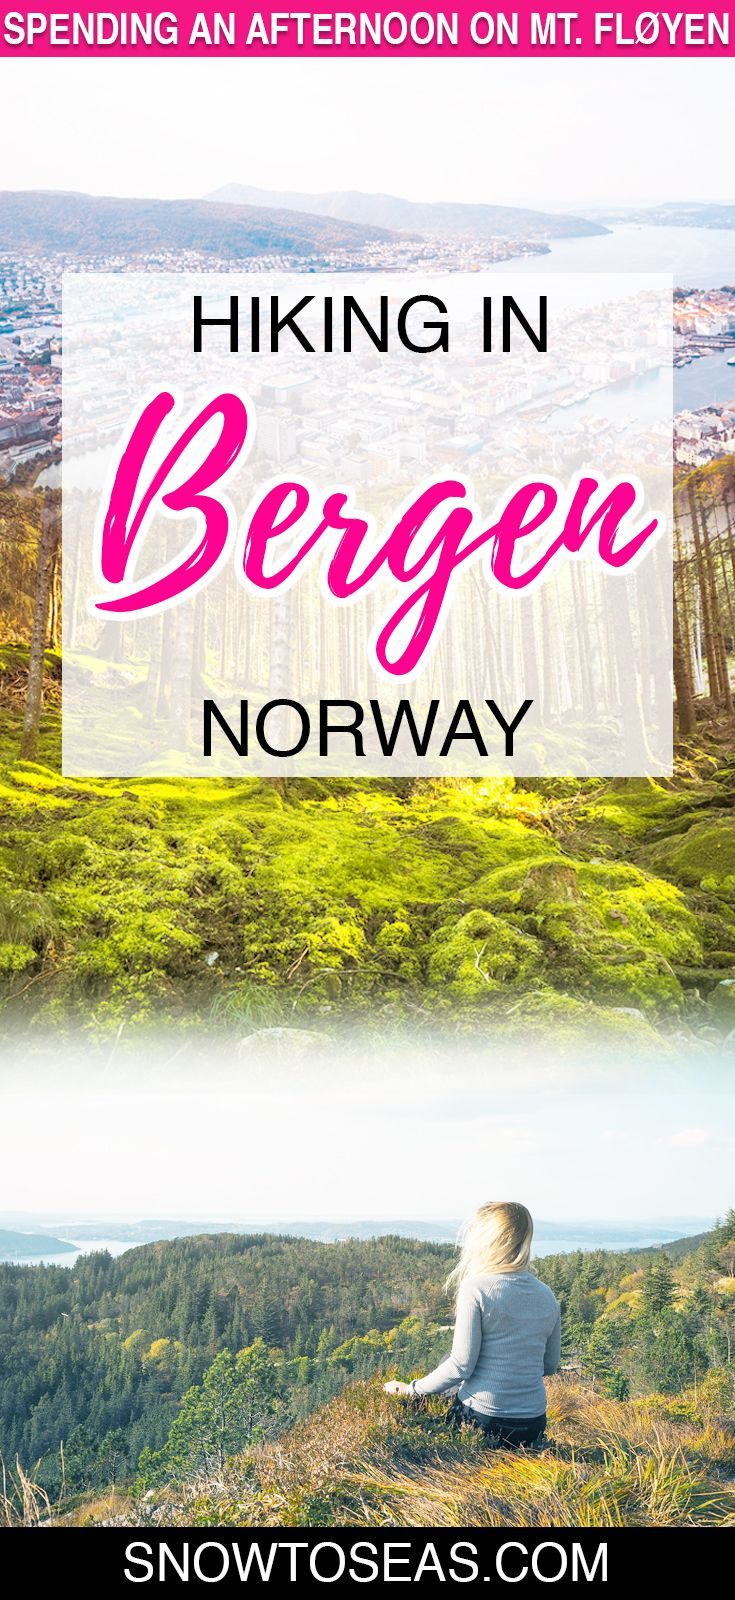 Hiking in Bergen, Norway - spending an afternoon on Mt. Floyen